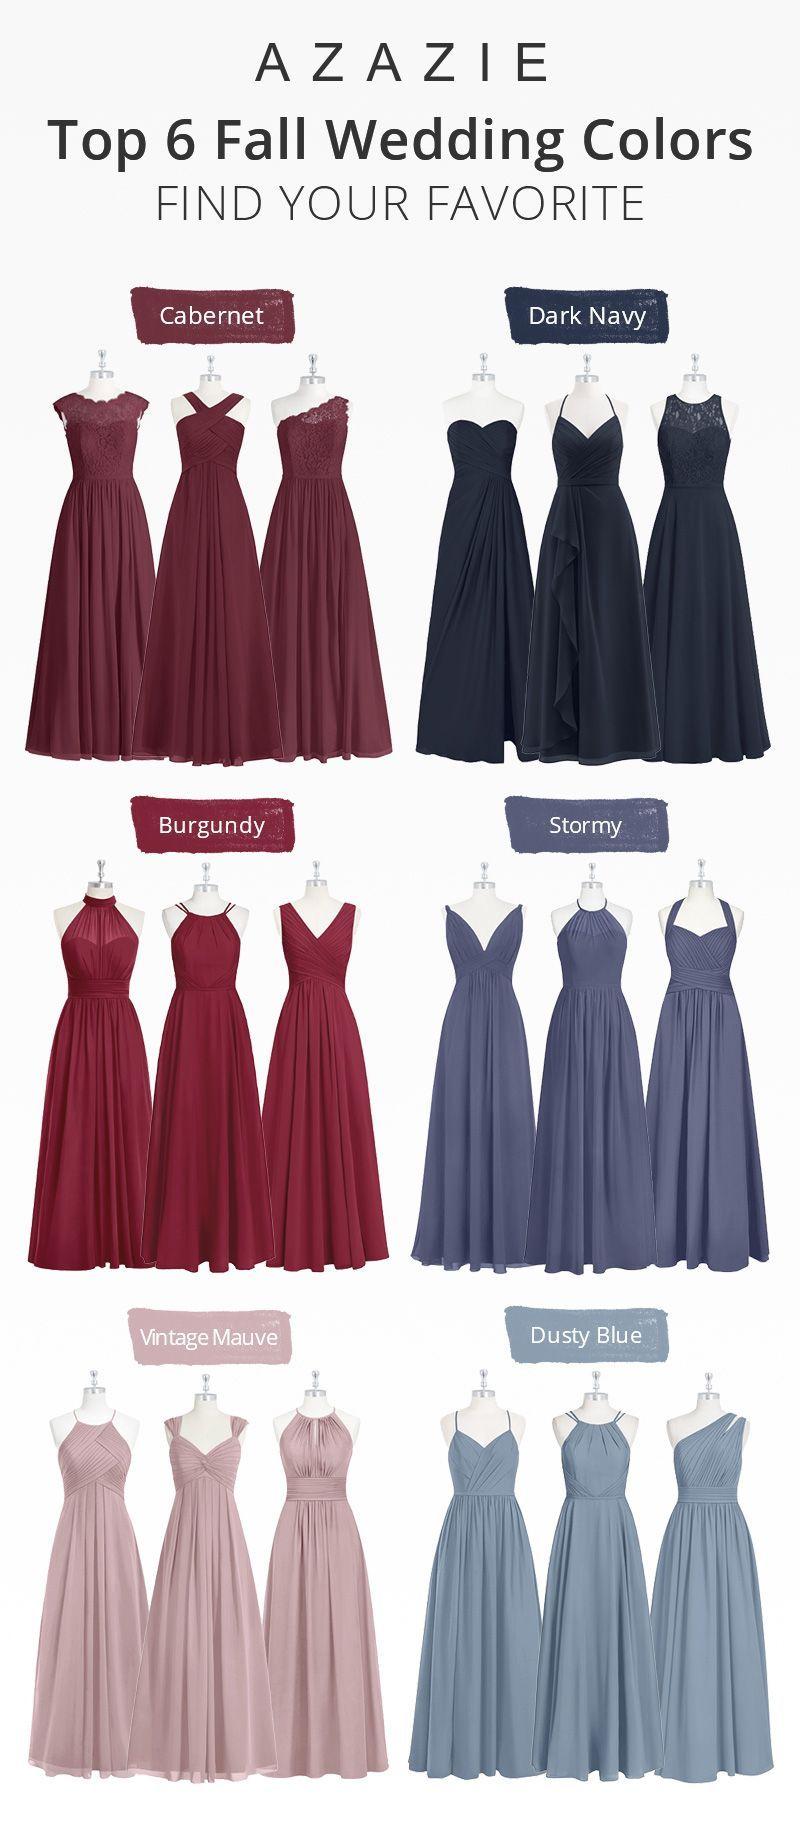 Top 6 Fall Wedding Colors Fall Bridesmaid Dresses Mauve Bridesmaid Dress Stormy Bridesmaid Dresses [ 1823 x 800 Pixel ]